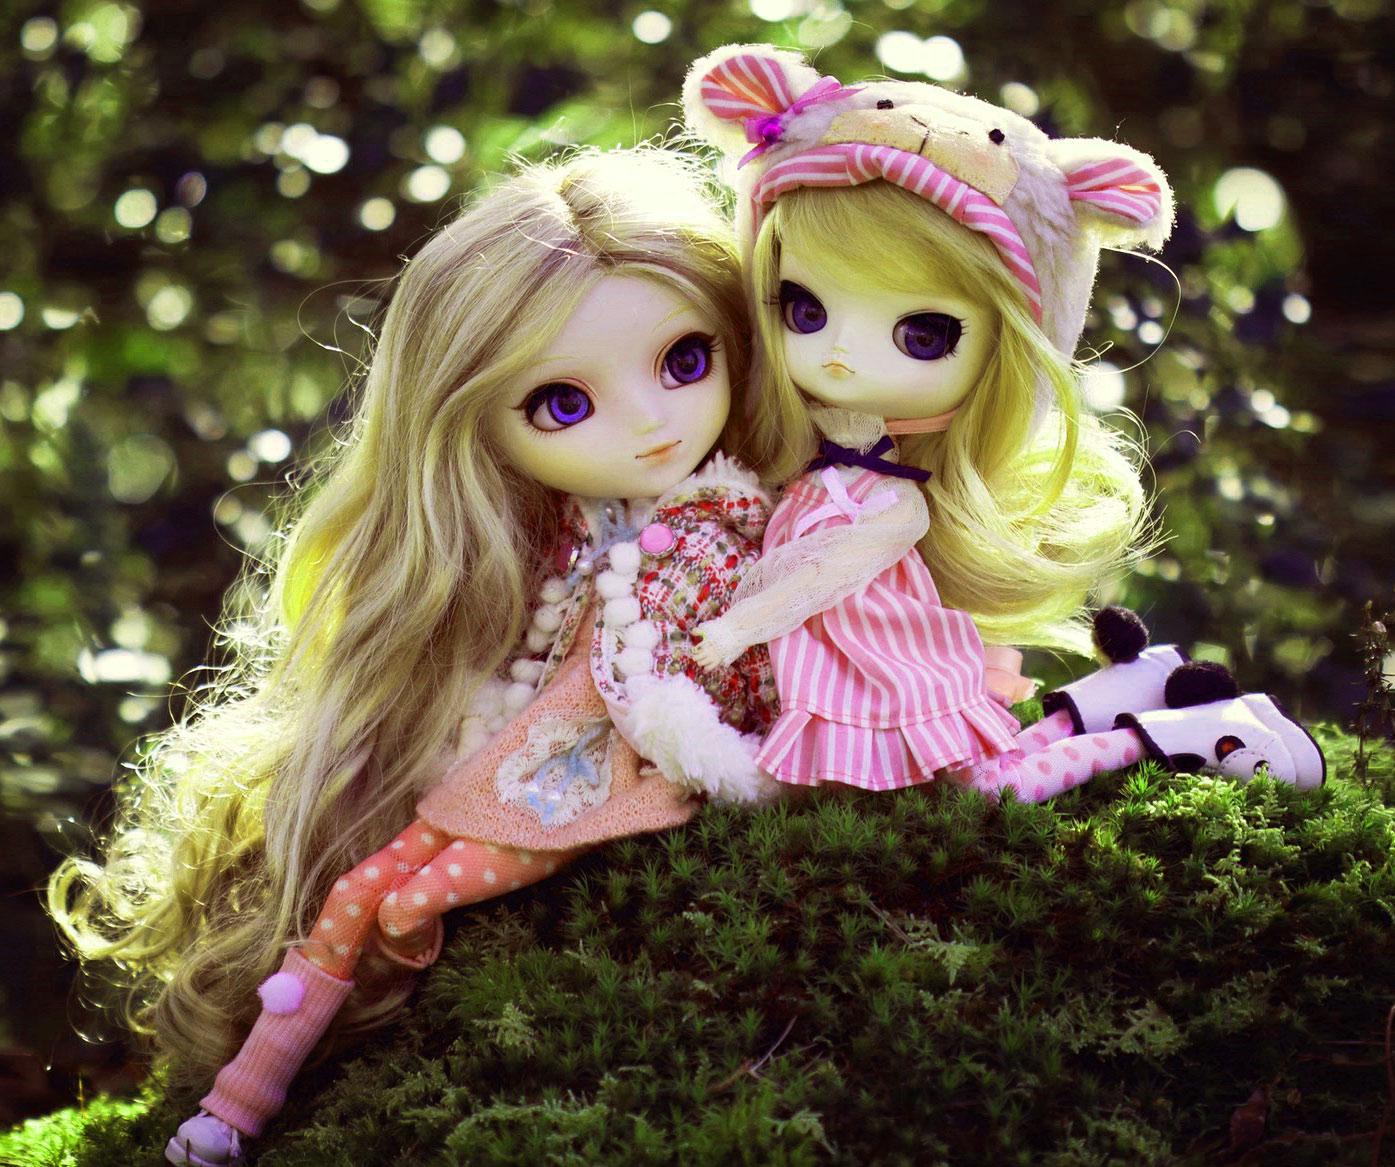 Cute HD sweet whatapp dp Images 1